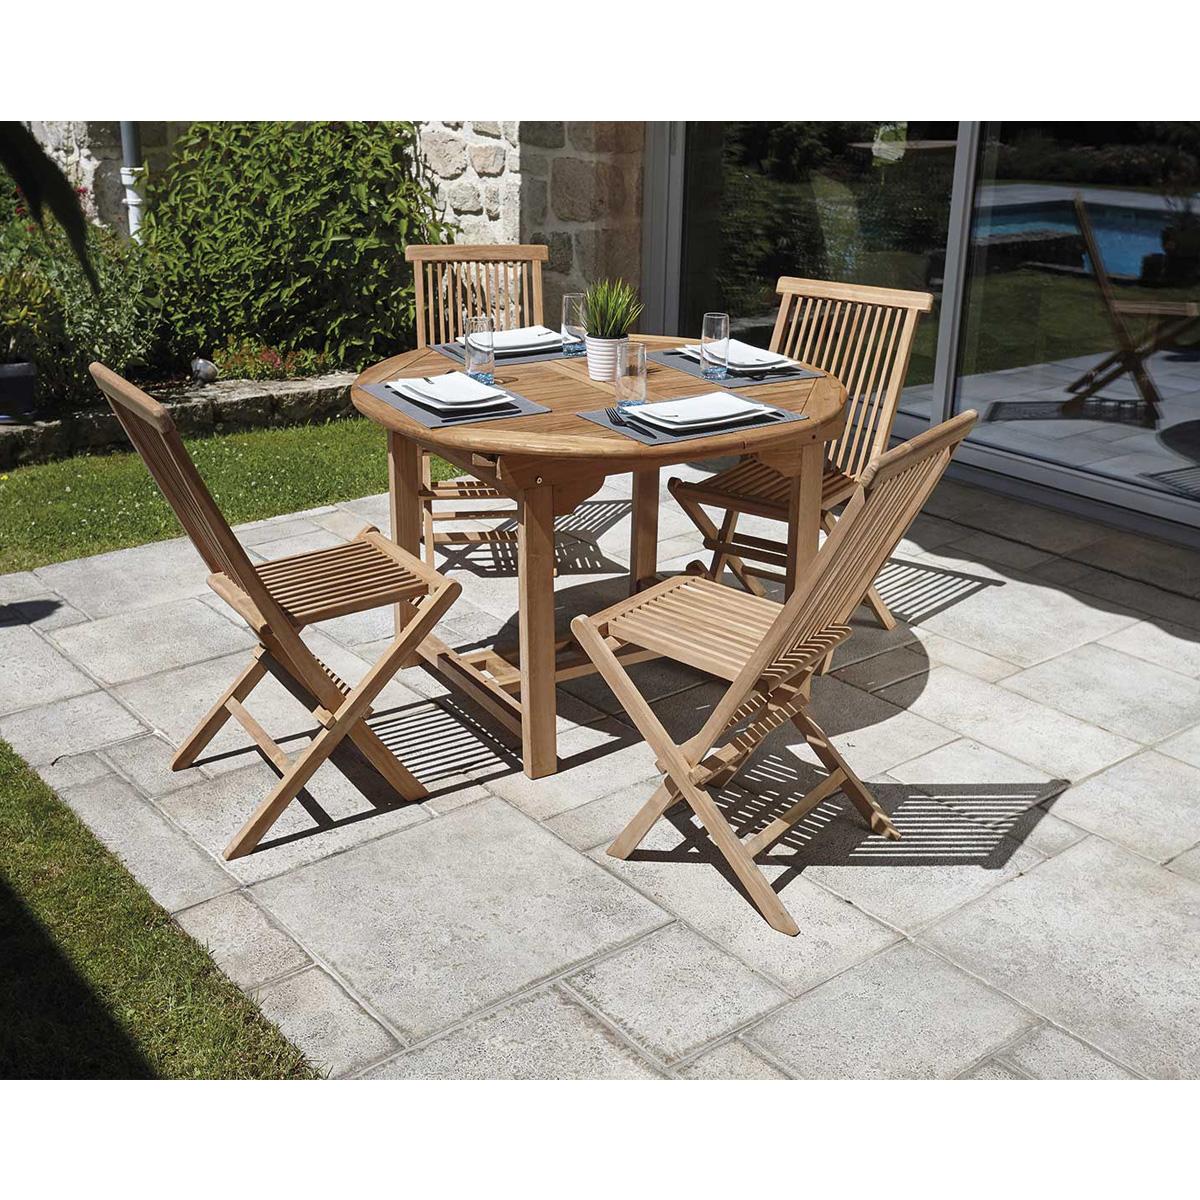 Ensemble en teck octogonal - Bois - Ø 120 cm + 4 chaises